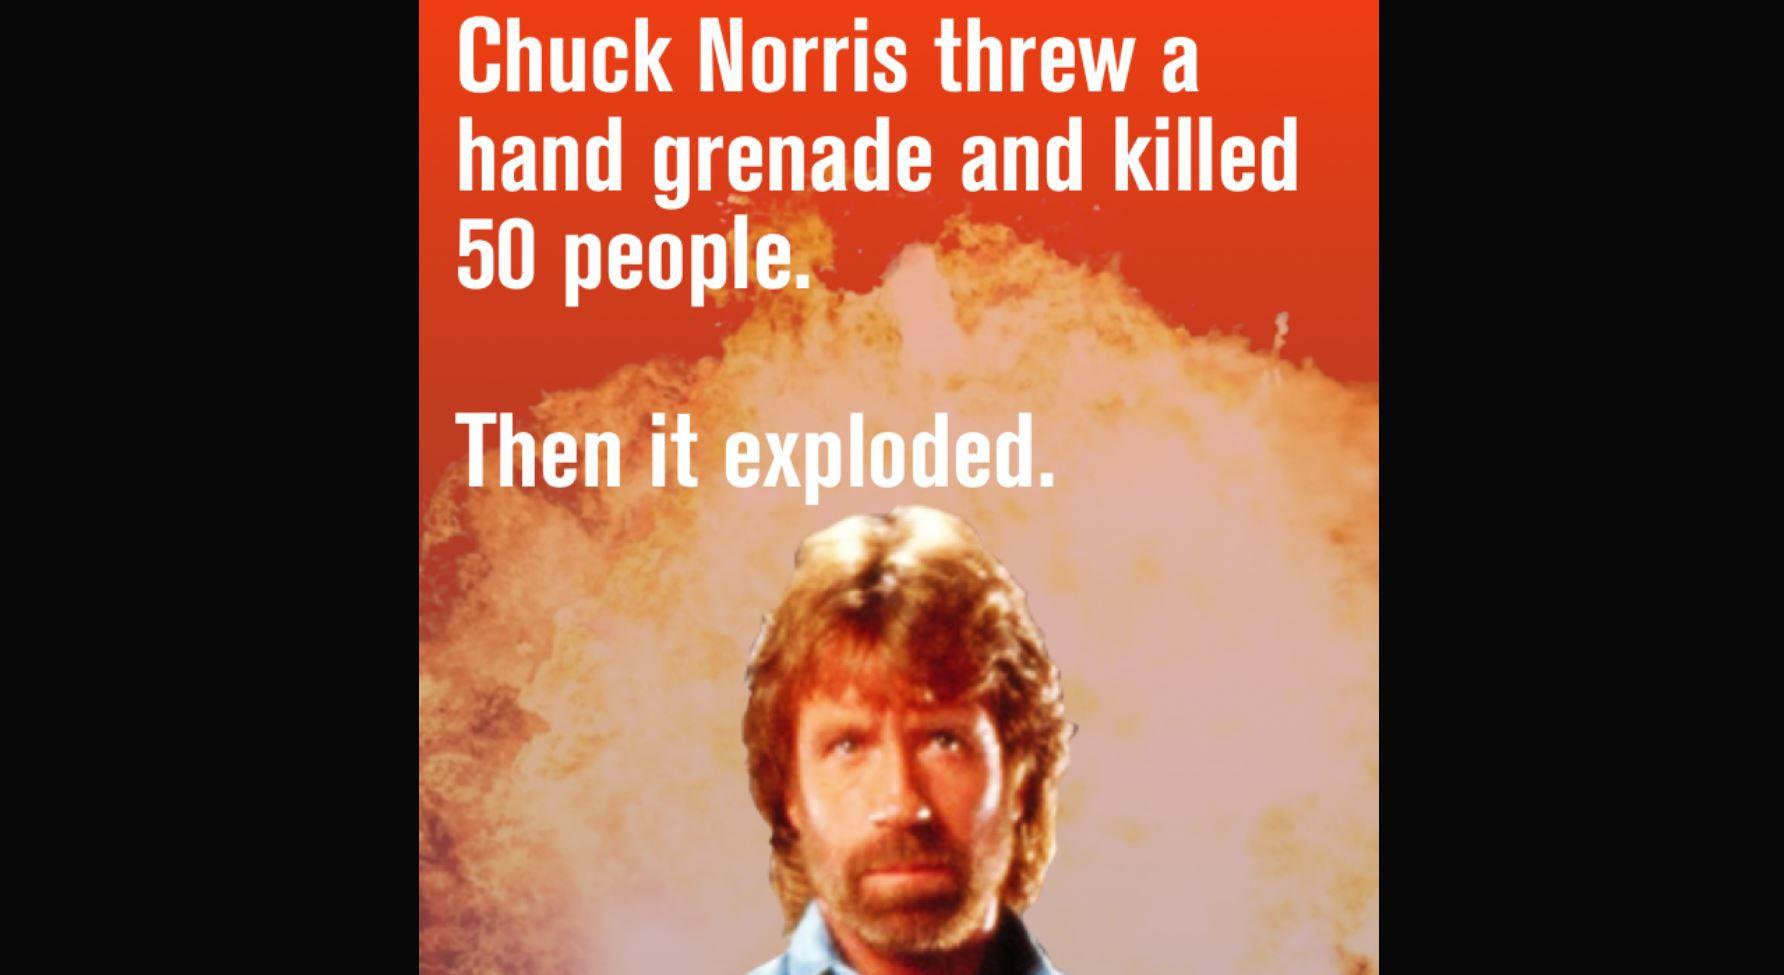 chuck norris hand grenade meme